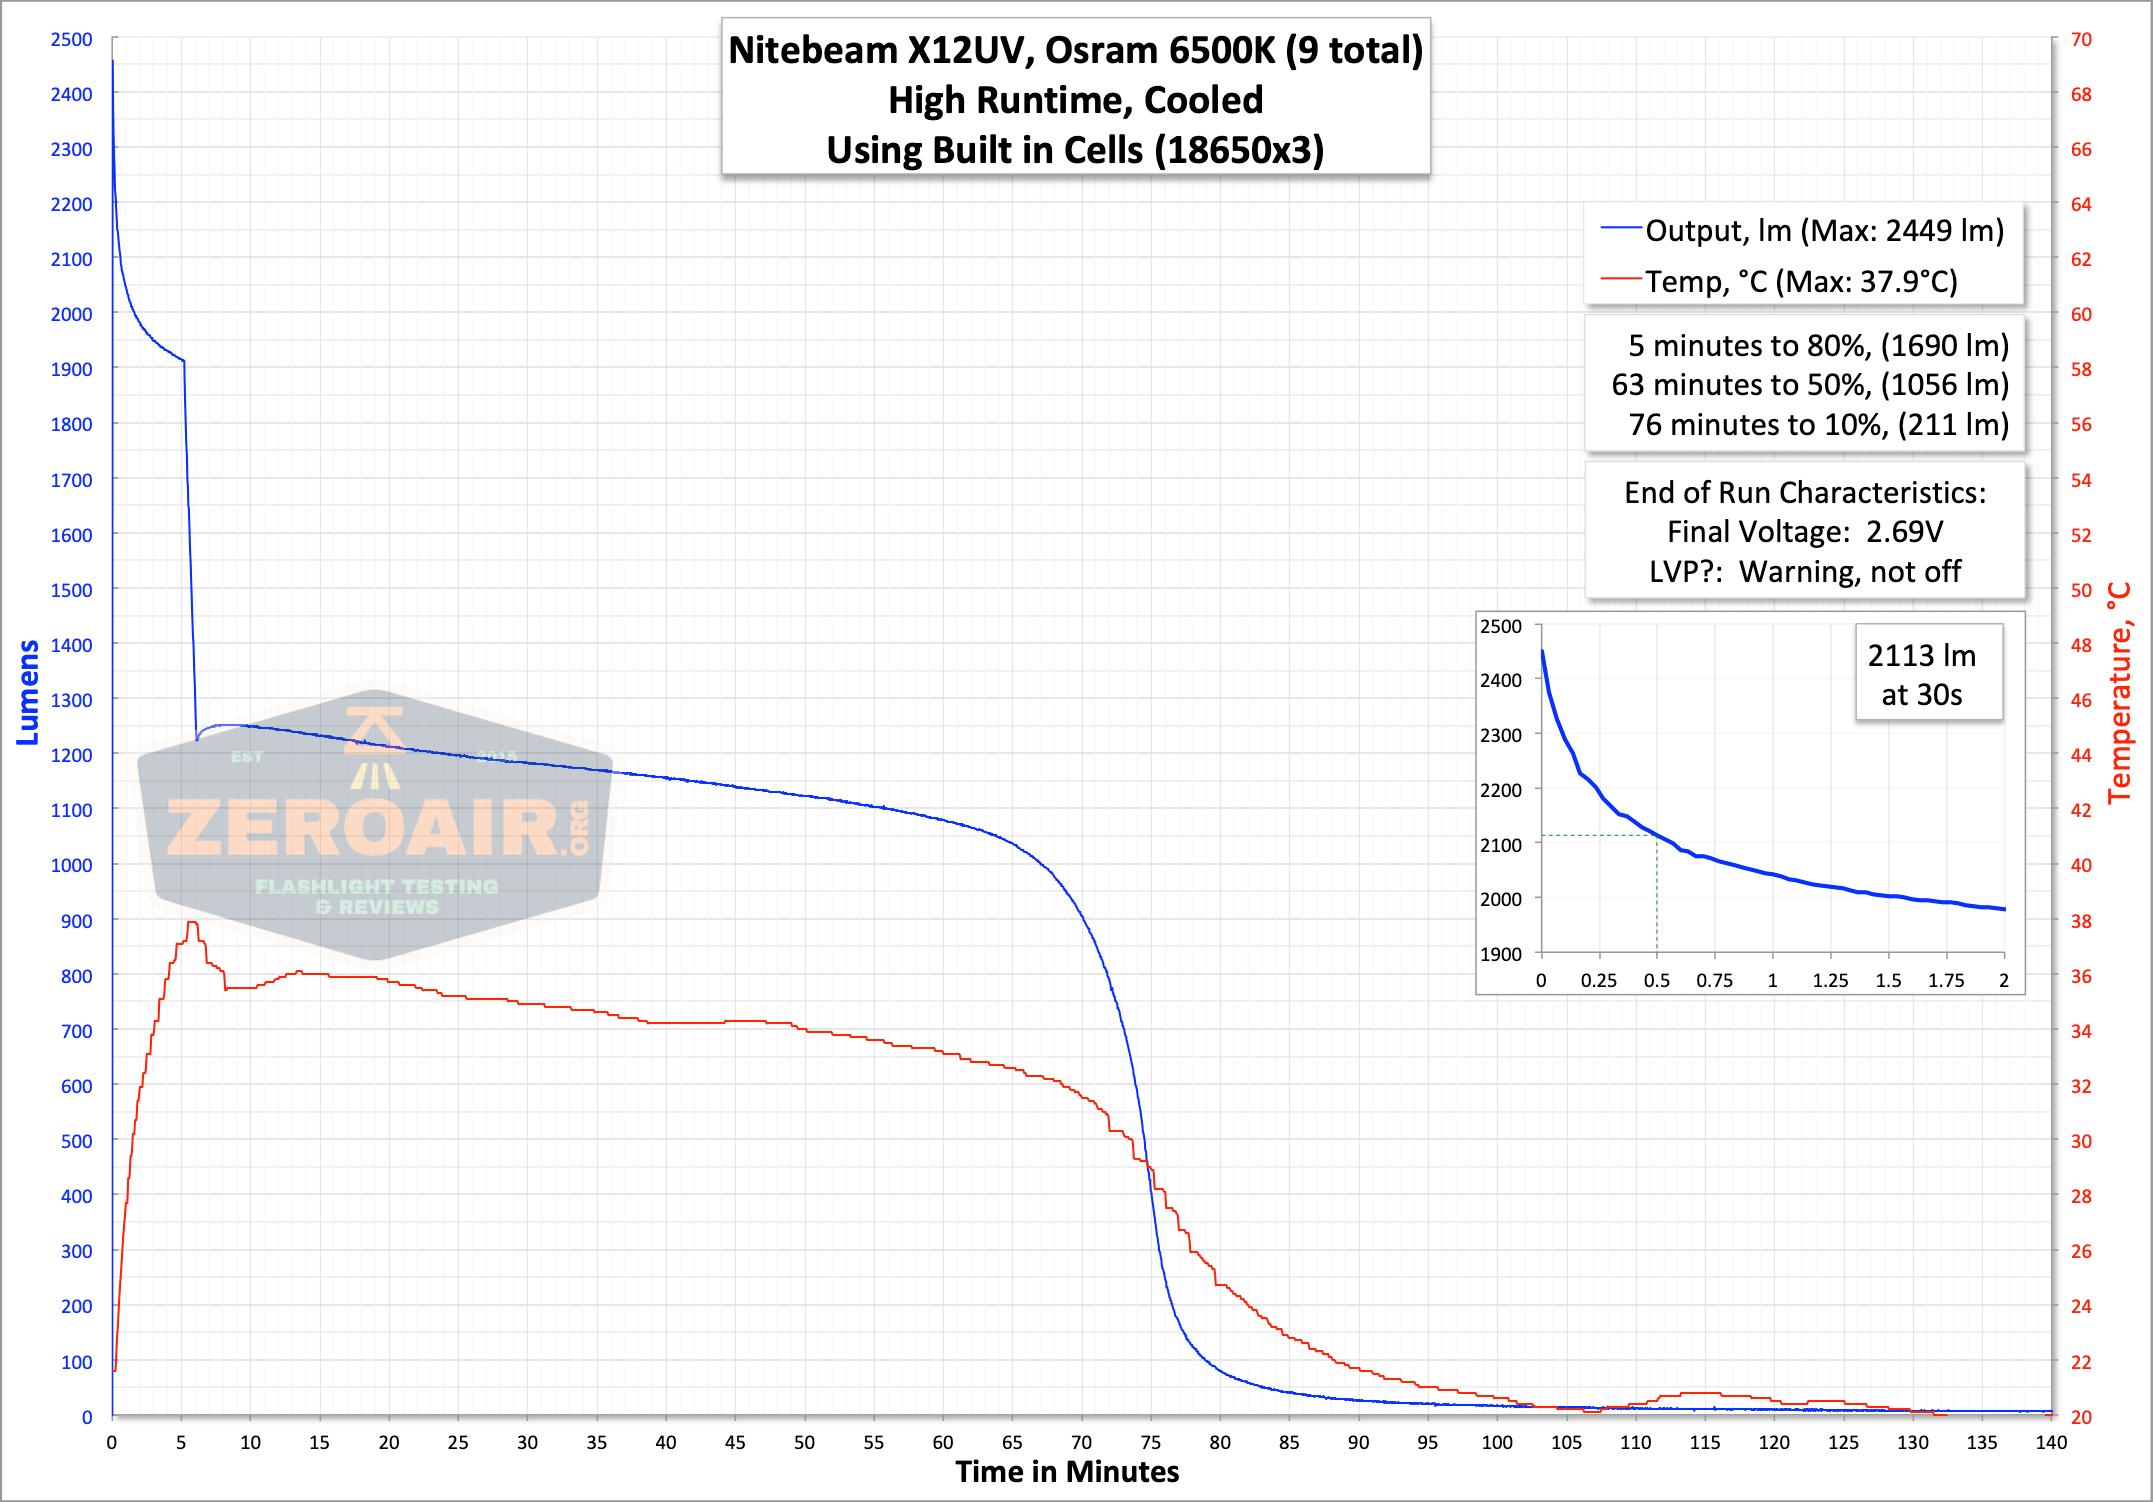 nitebeam x12uv flashlight runtime graph on high